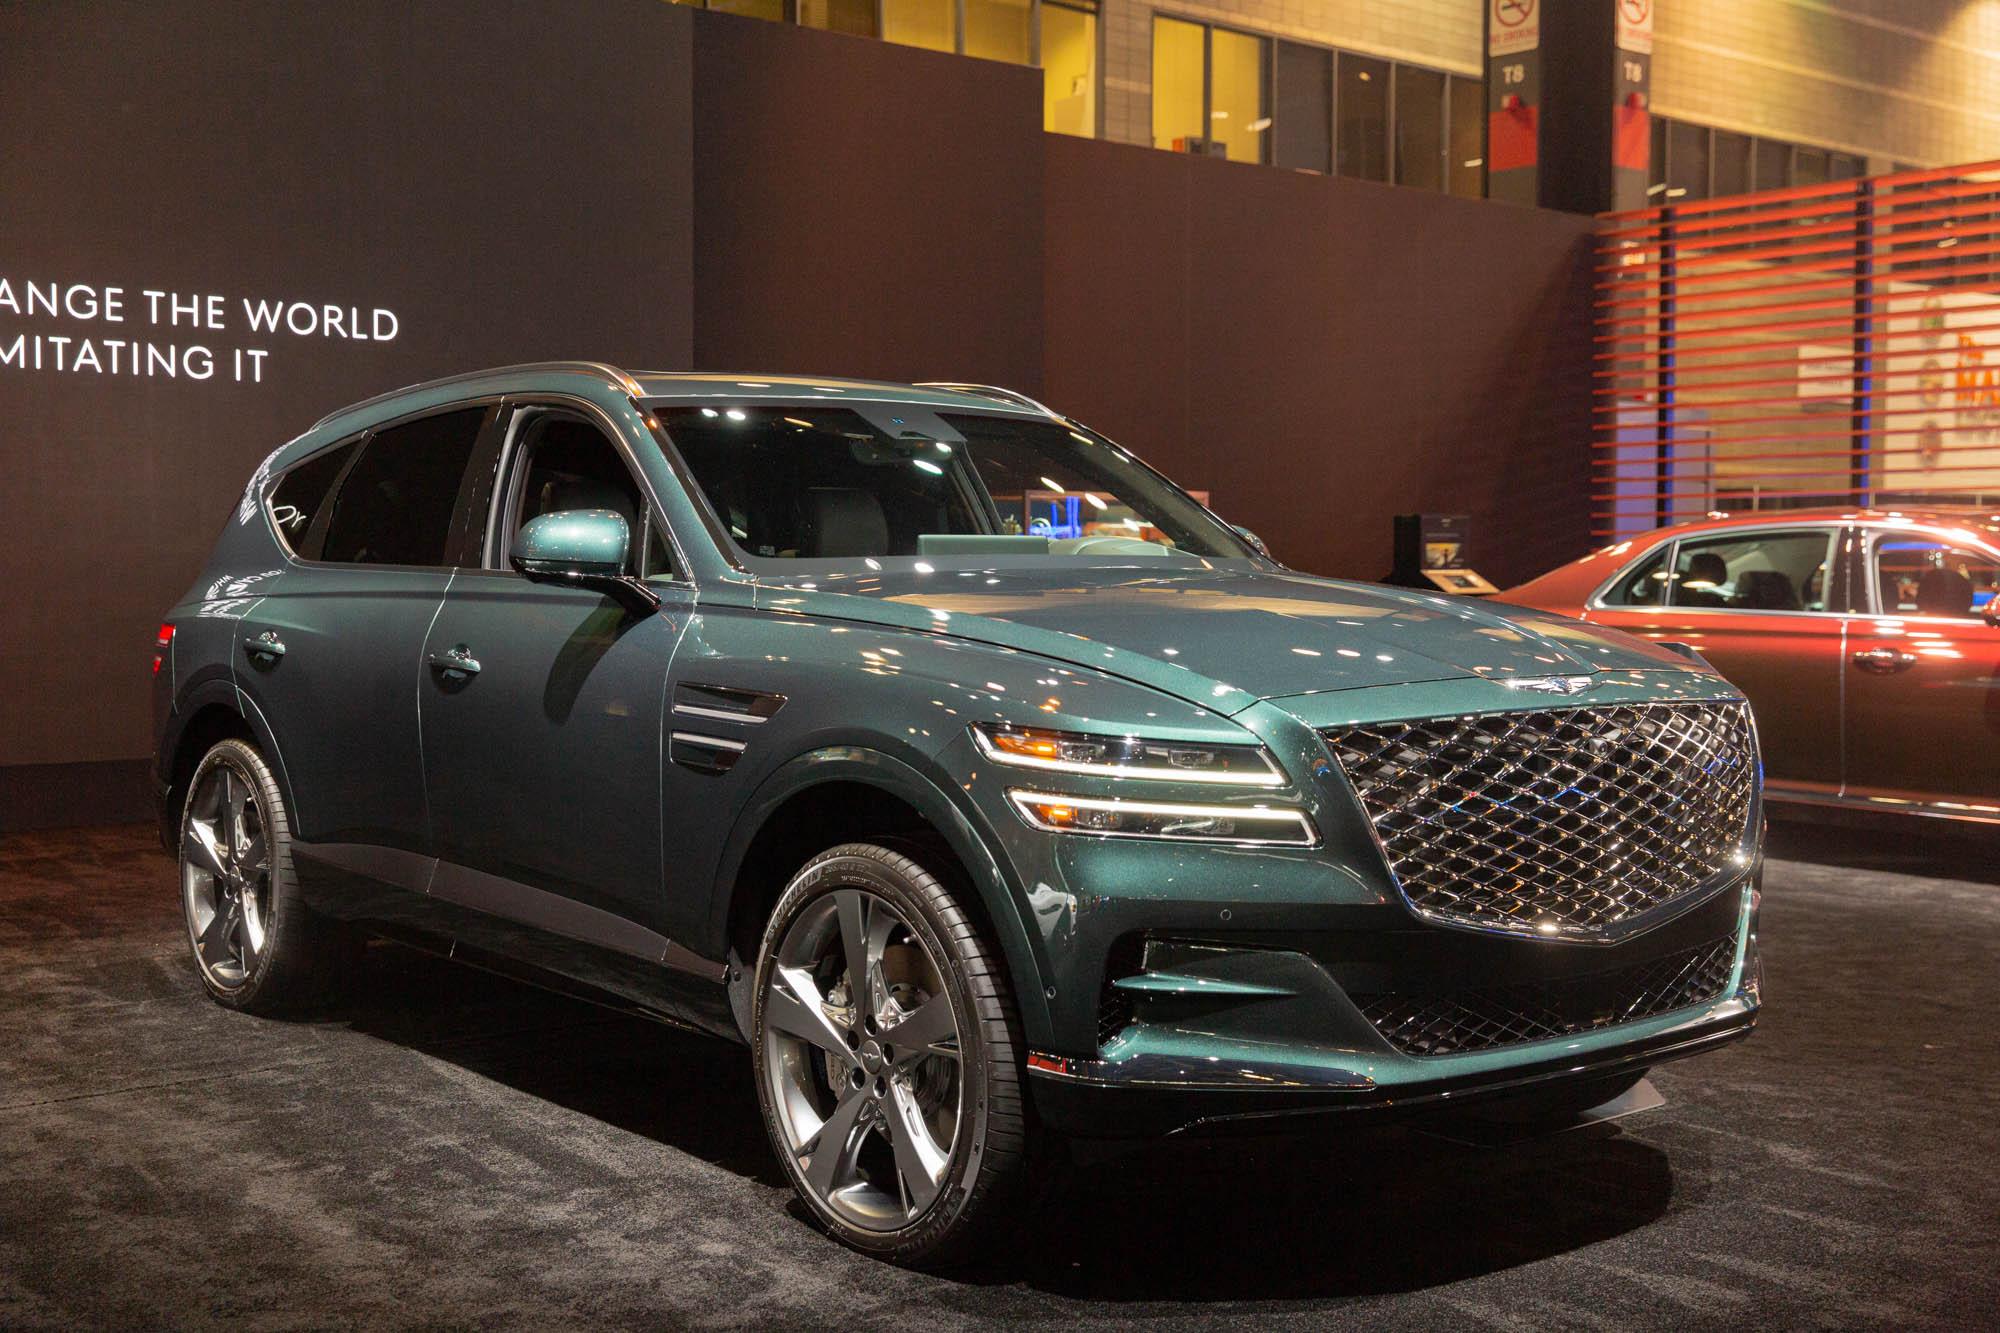 2021 Genesis GV80 luxury crossover SUV deserves attention